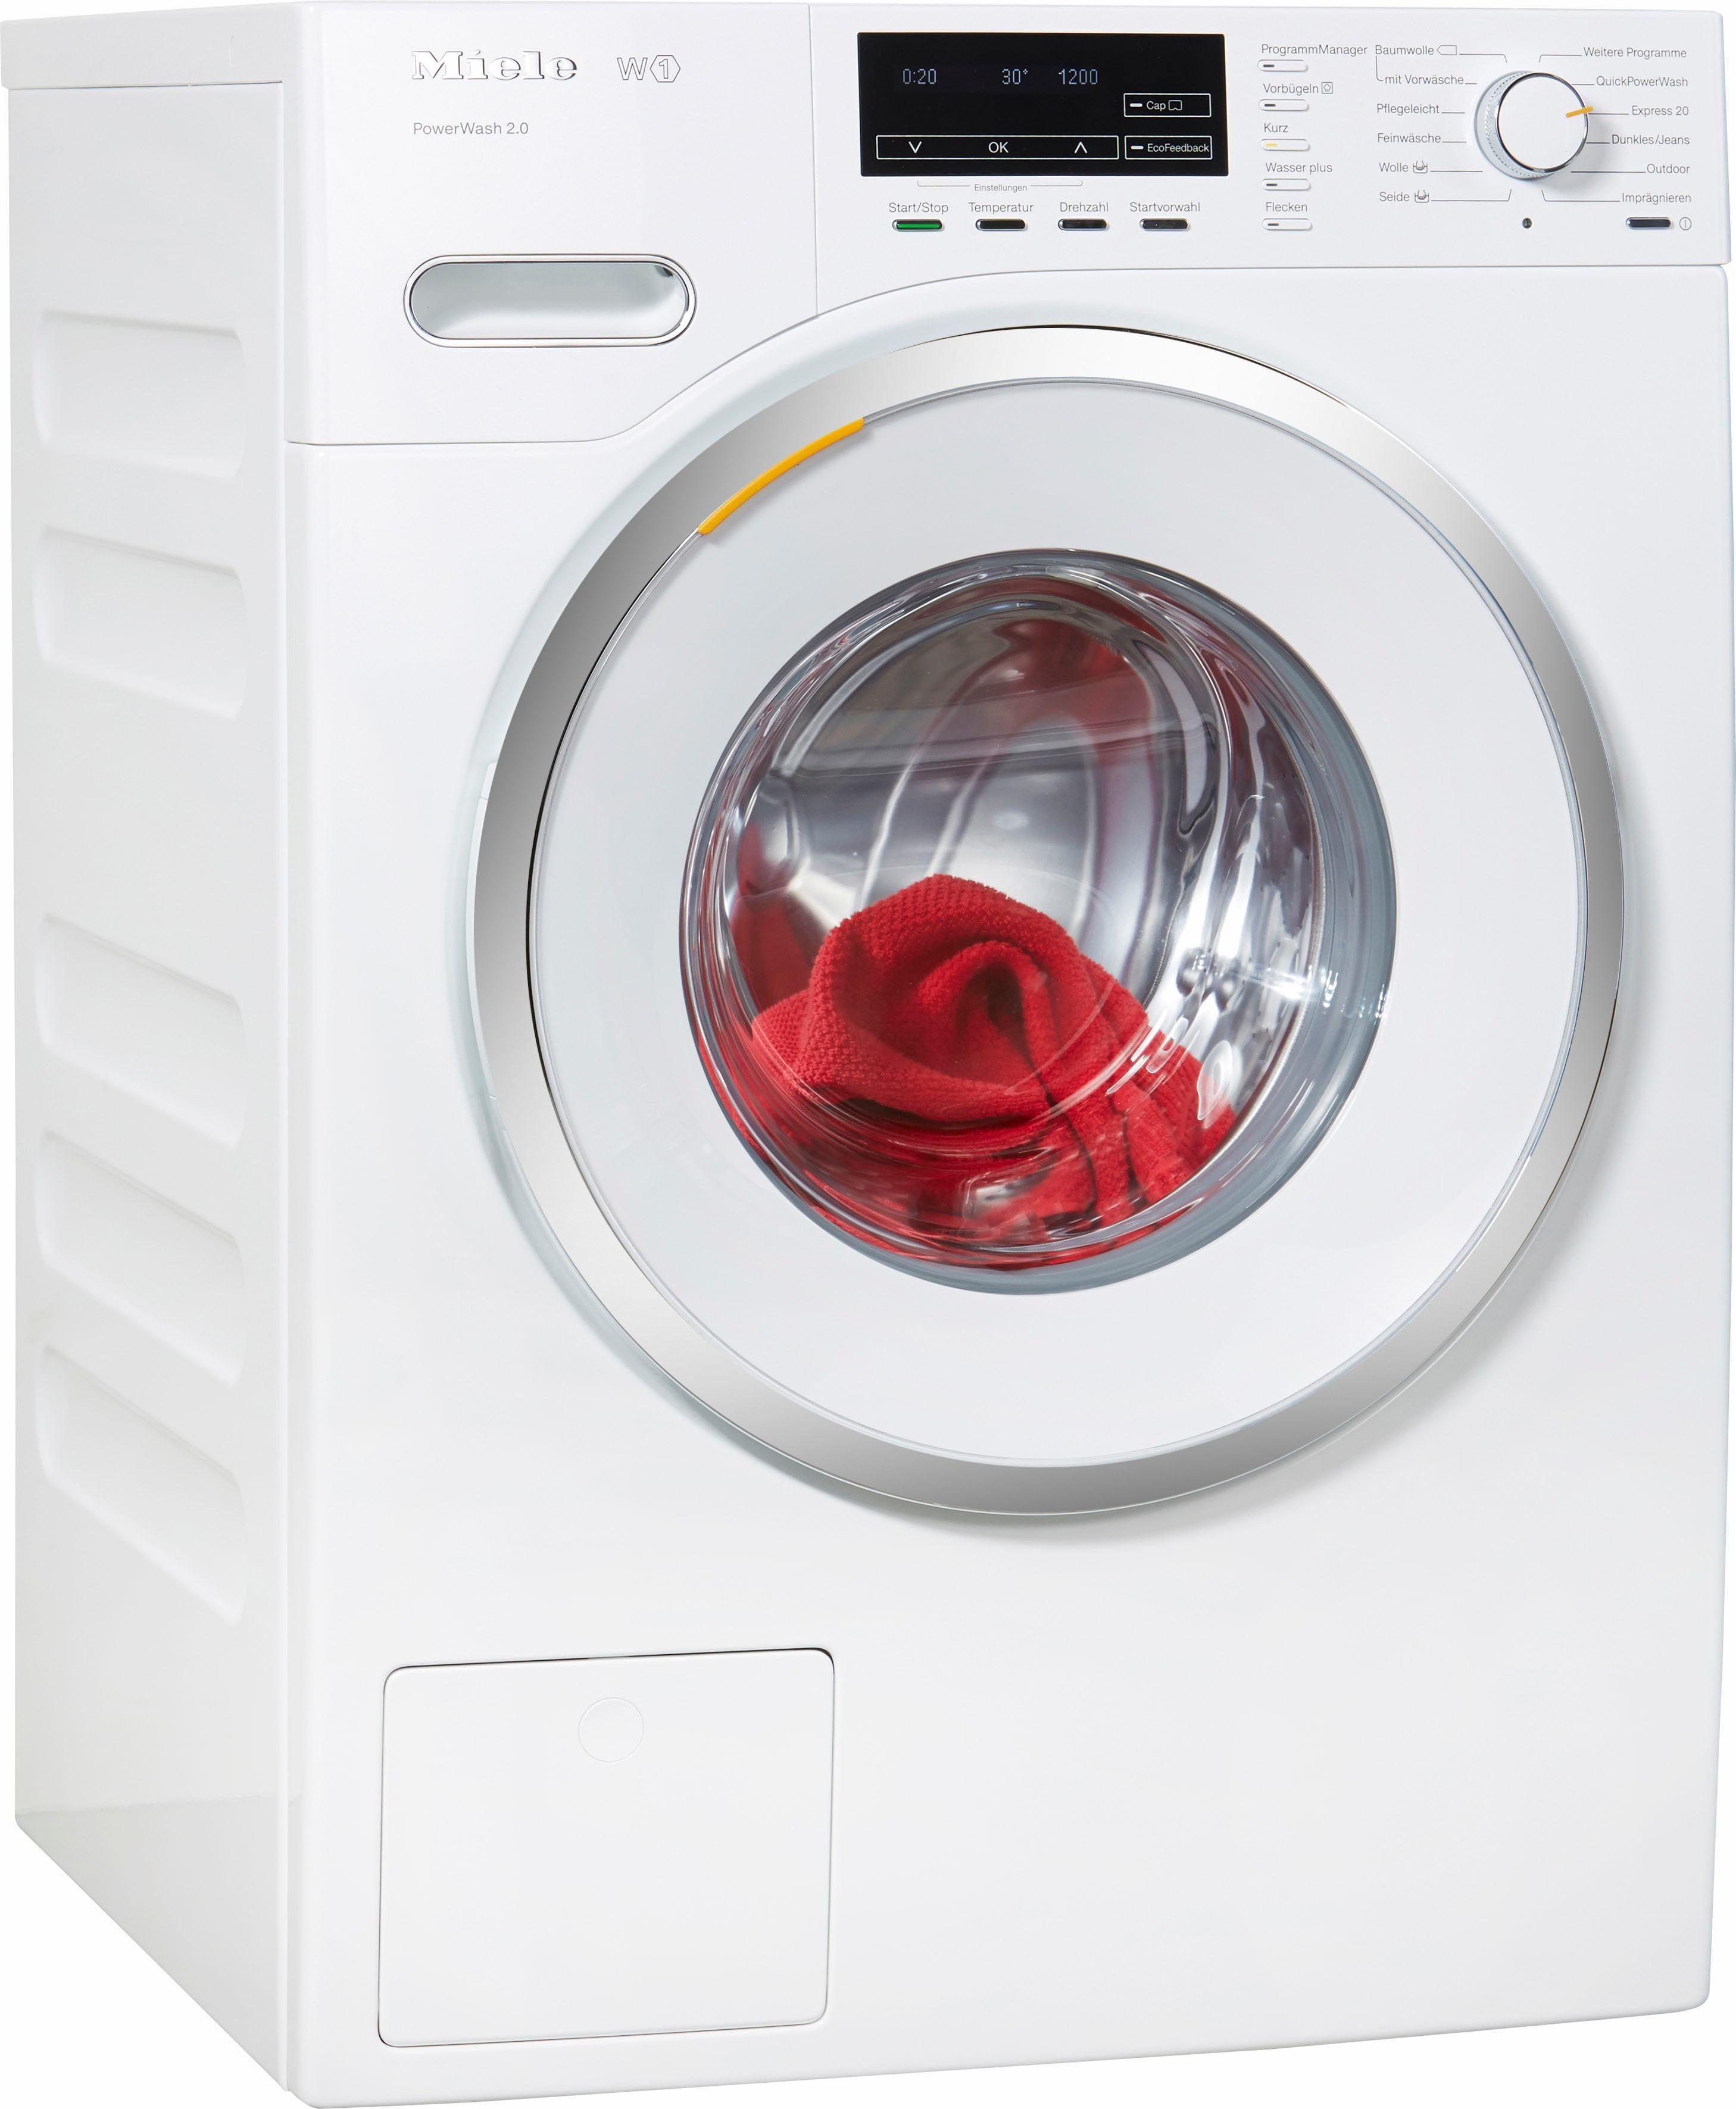 MIELE Waschmaschine WMF111WPS PWash 2.0, A+++, 8 kg, 1600 U/Min